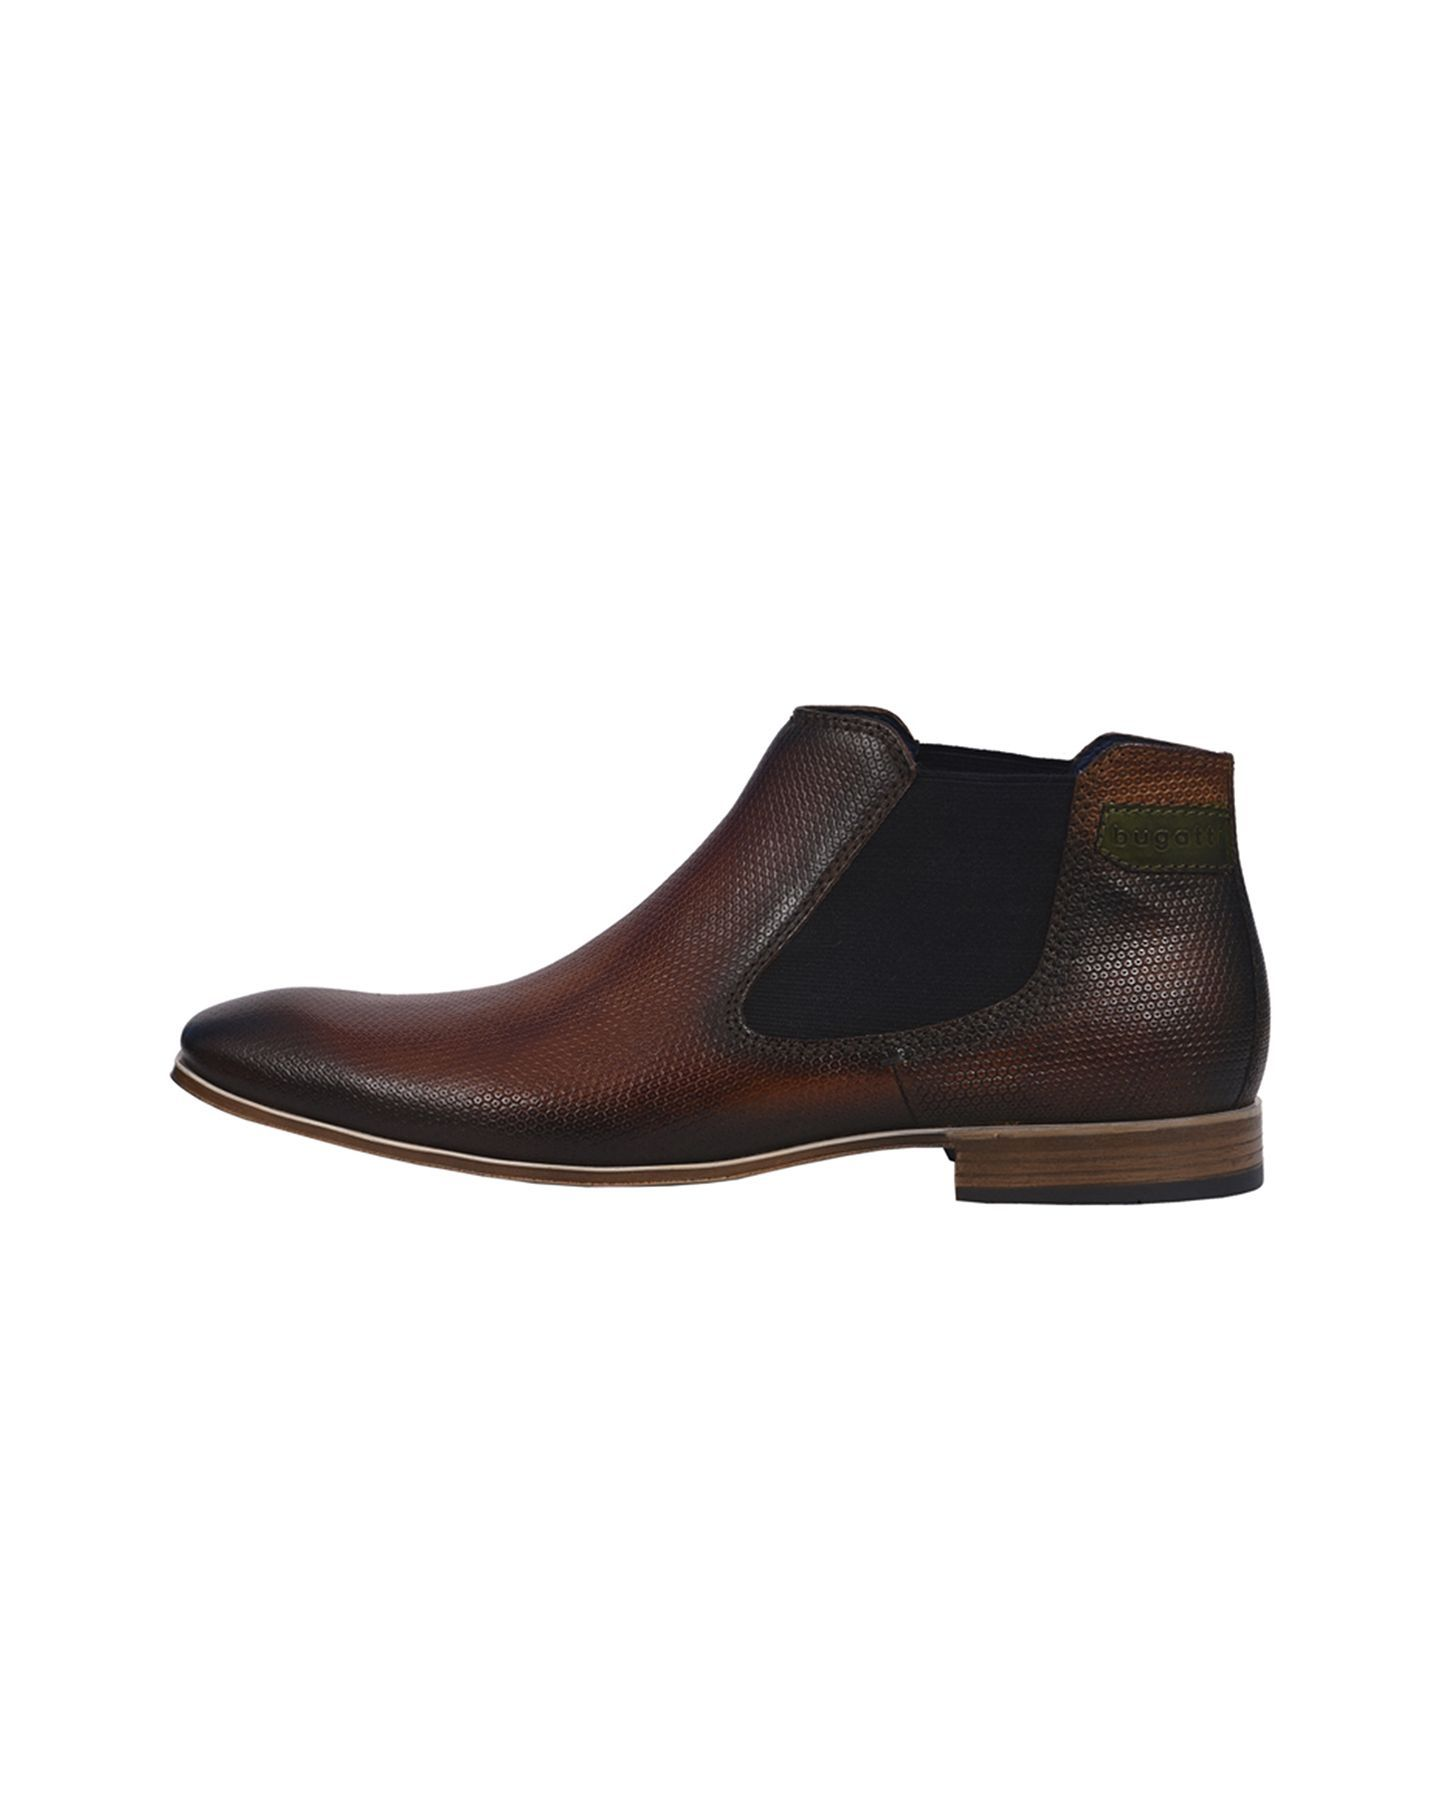 bugatti Chelsea boots in cognac in Größe 48